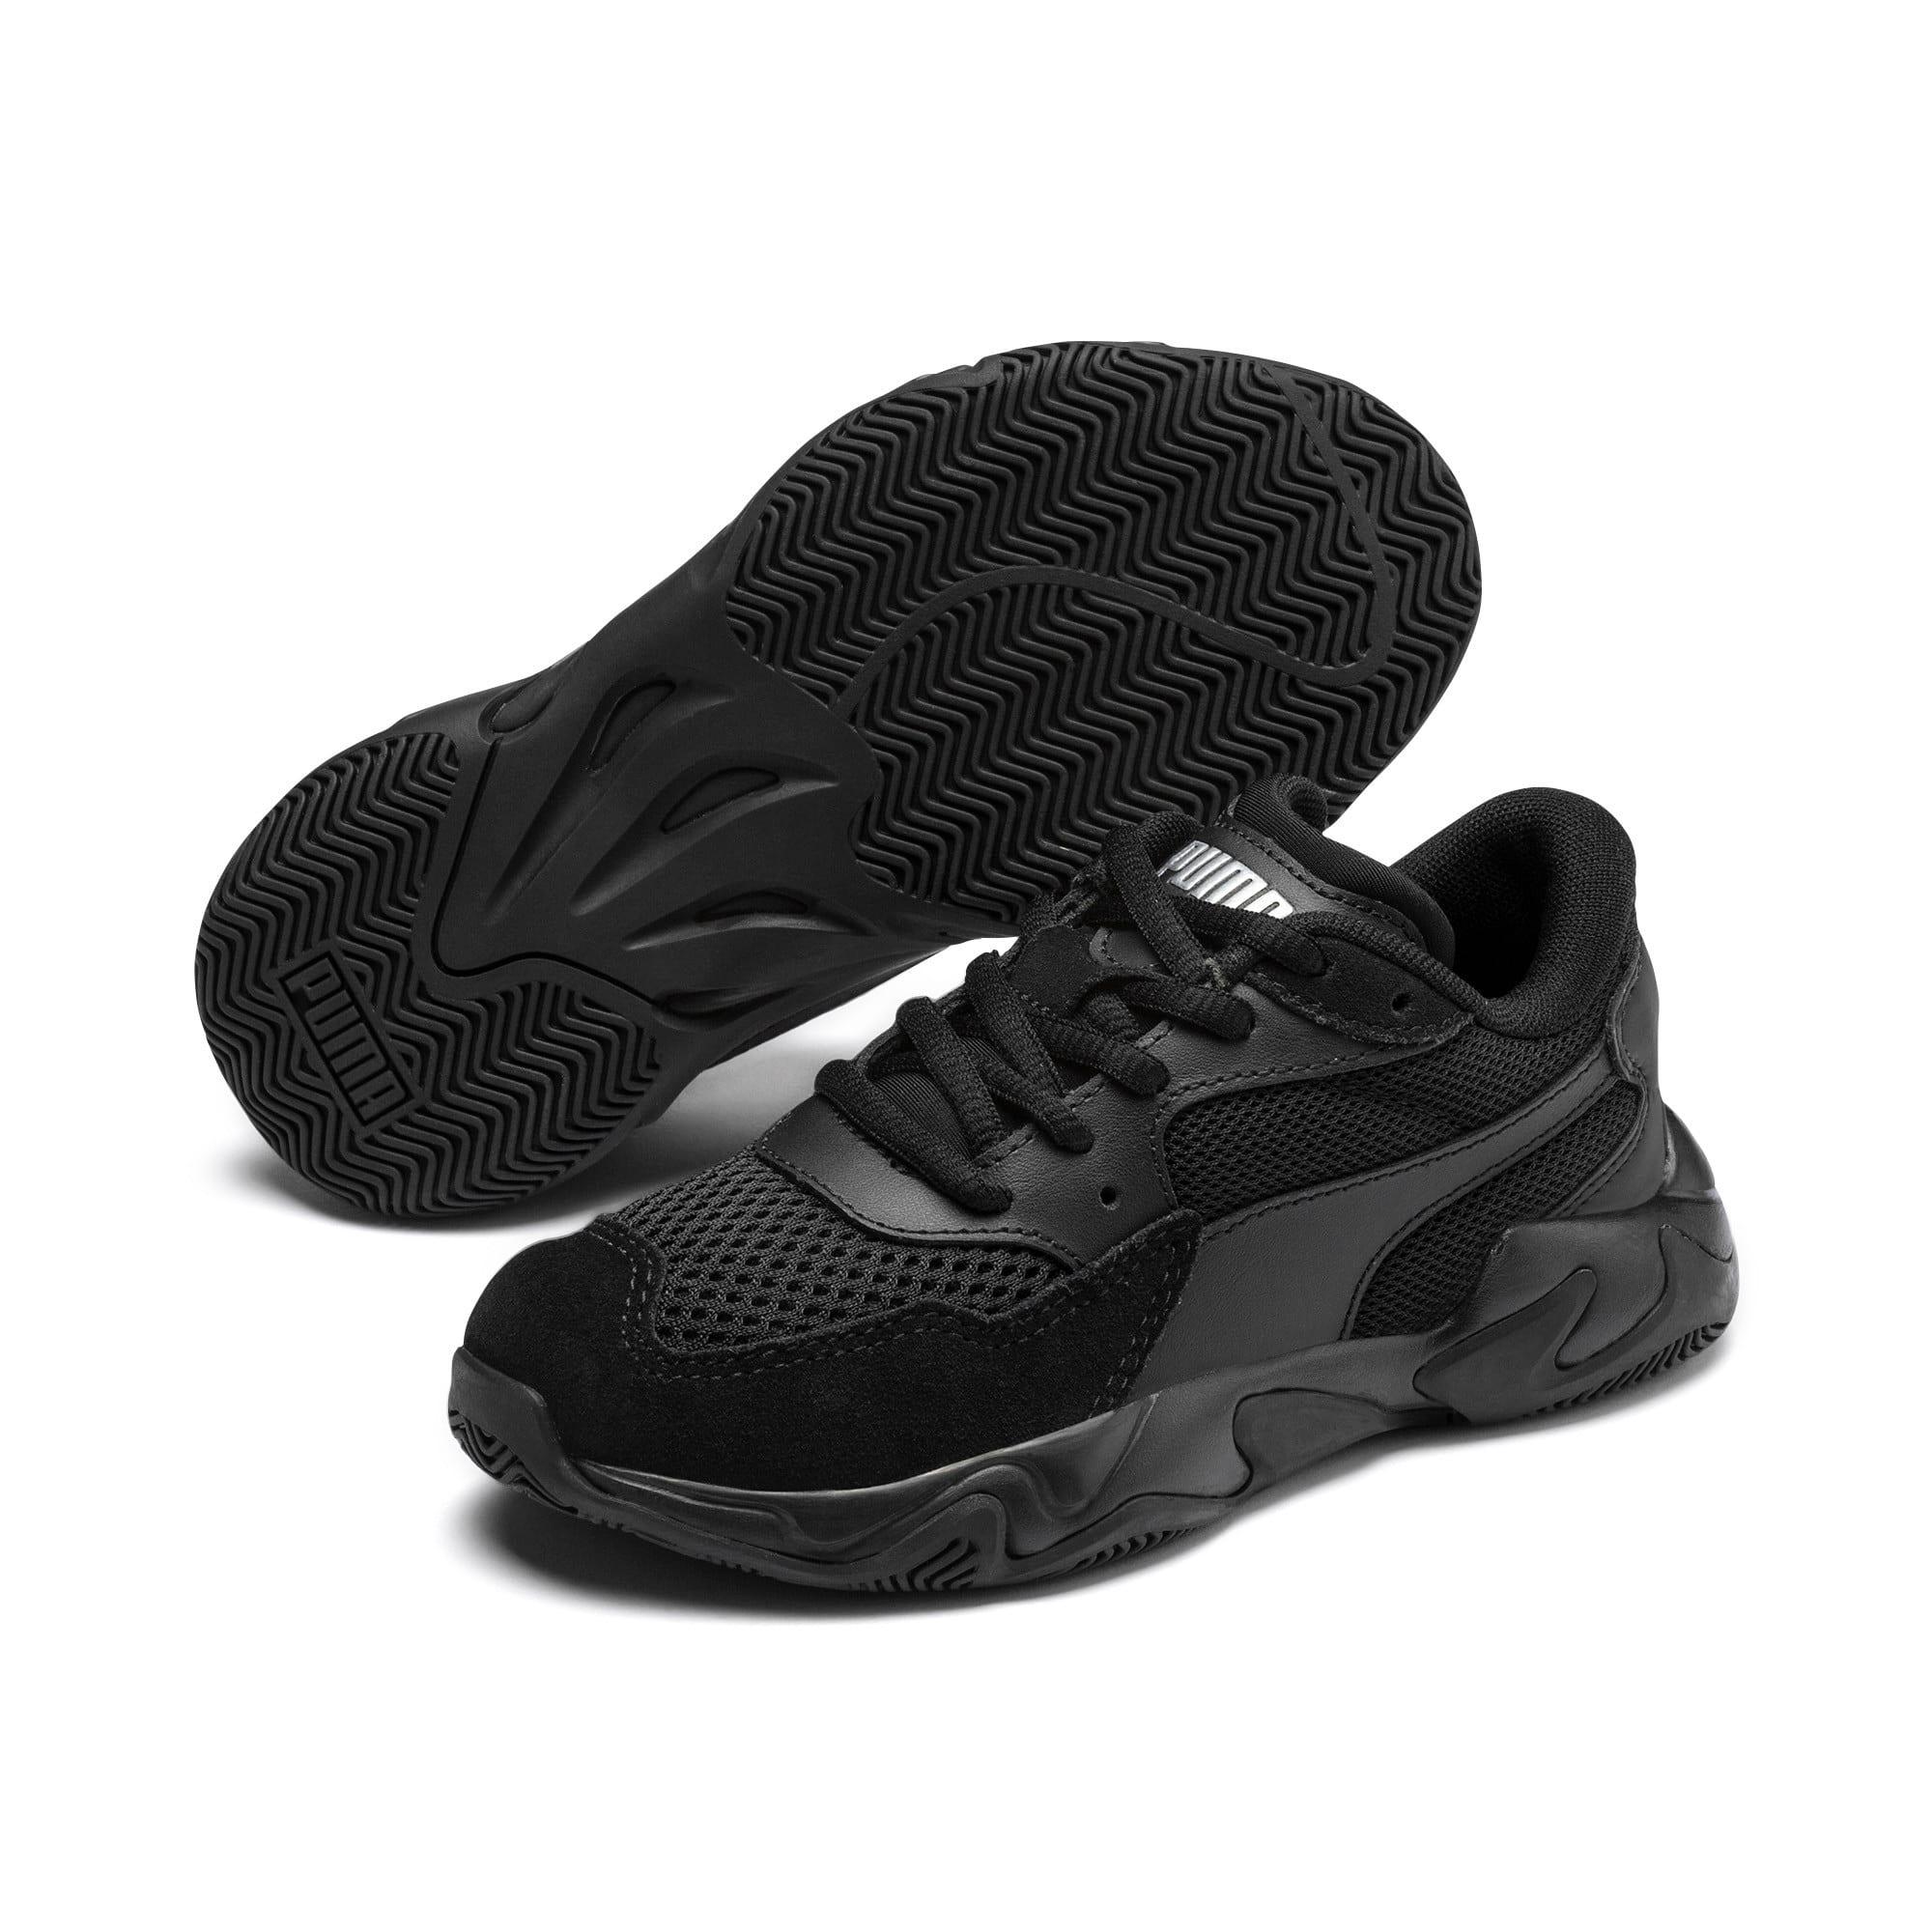 Thumbnail 2 of Storm Origin Little Kids' Shoes, Puma Black, medium